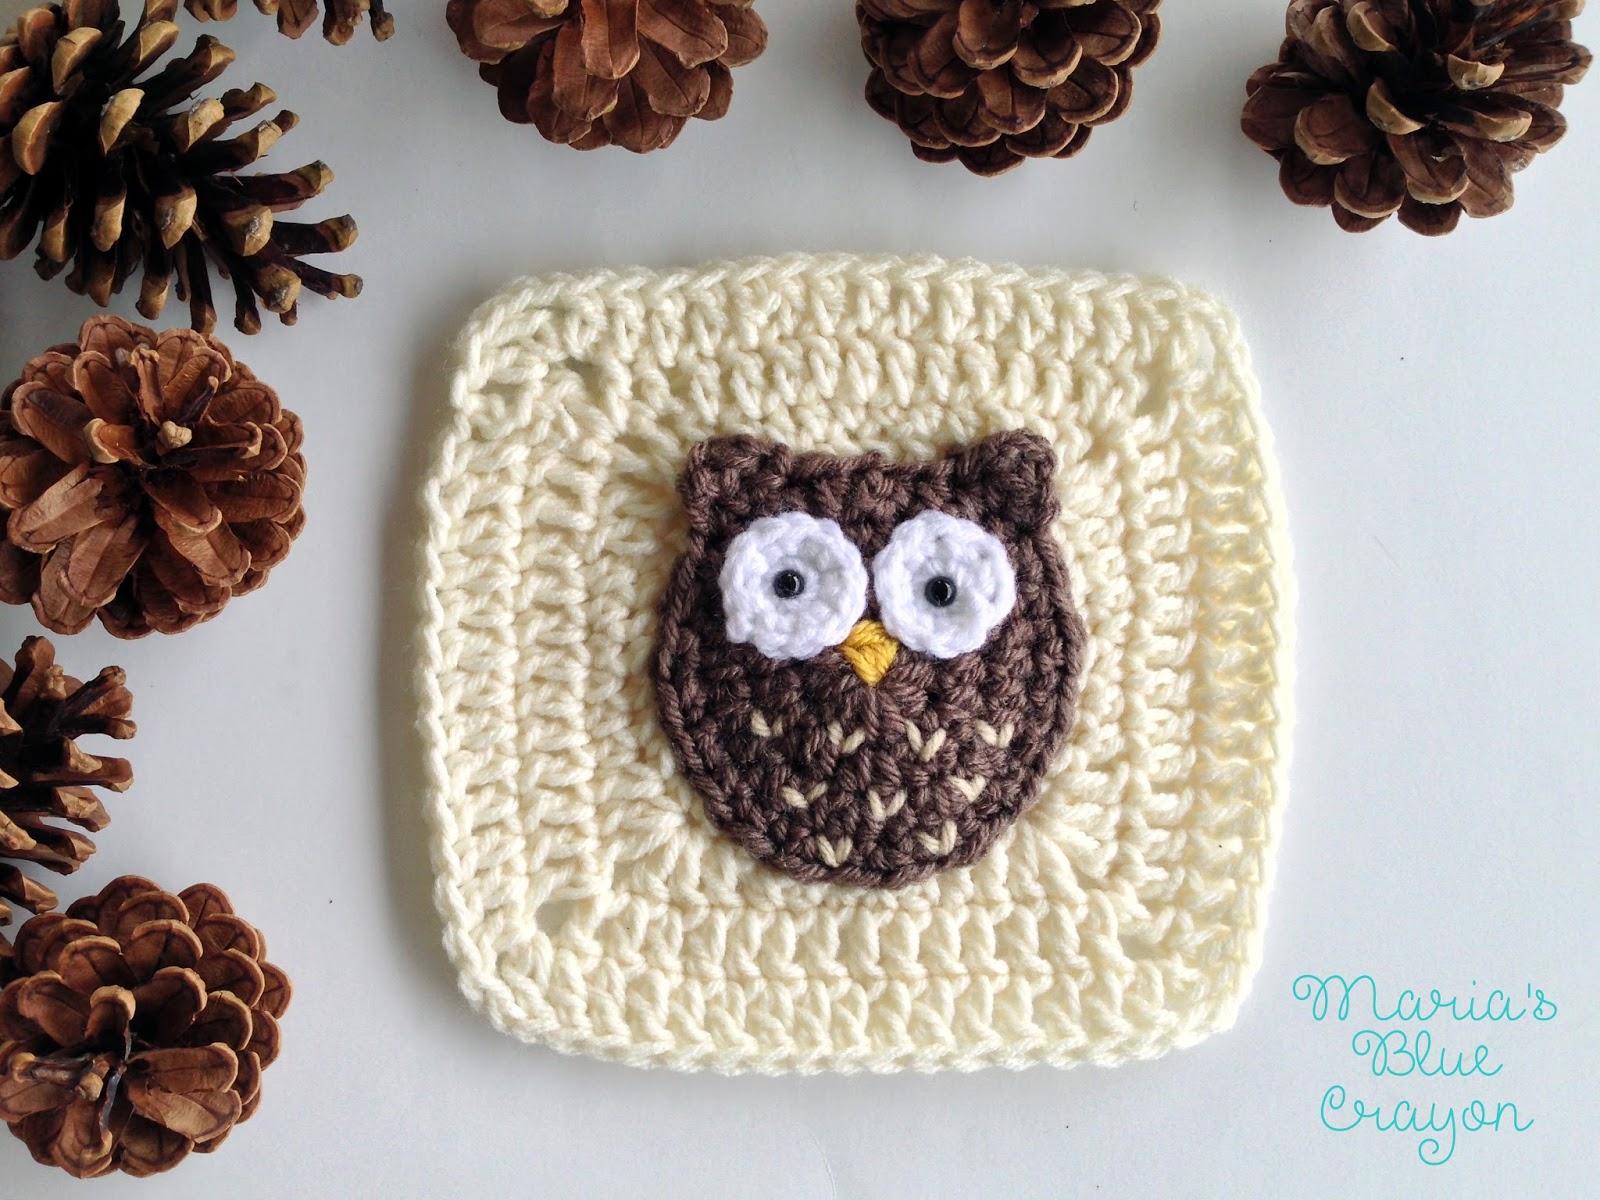 Charming Owls Free Crochet Patterns | 1200x1600